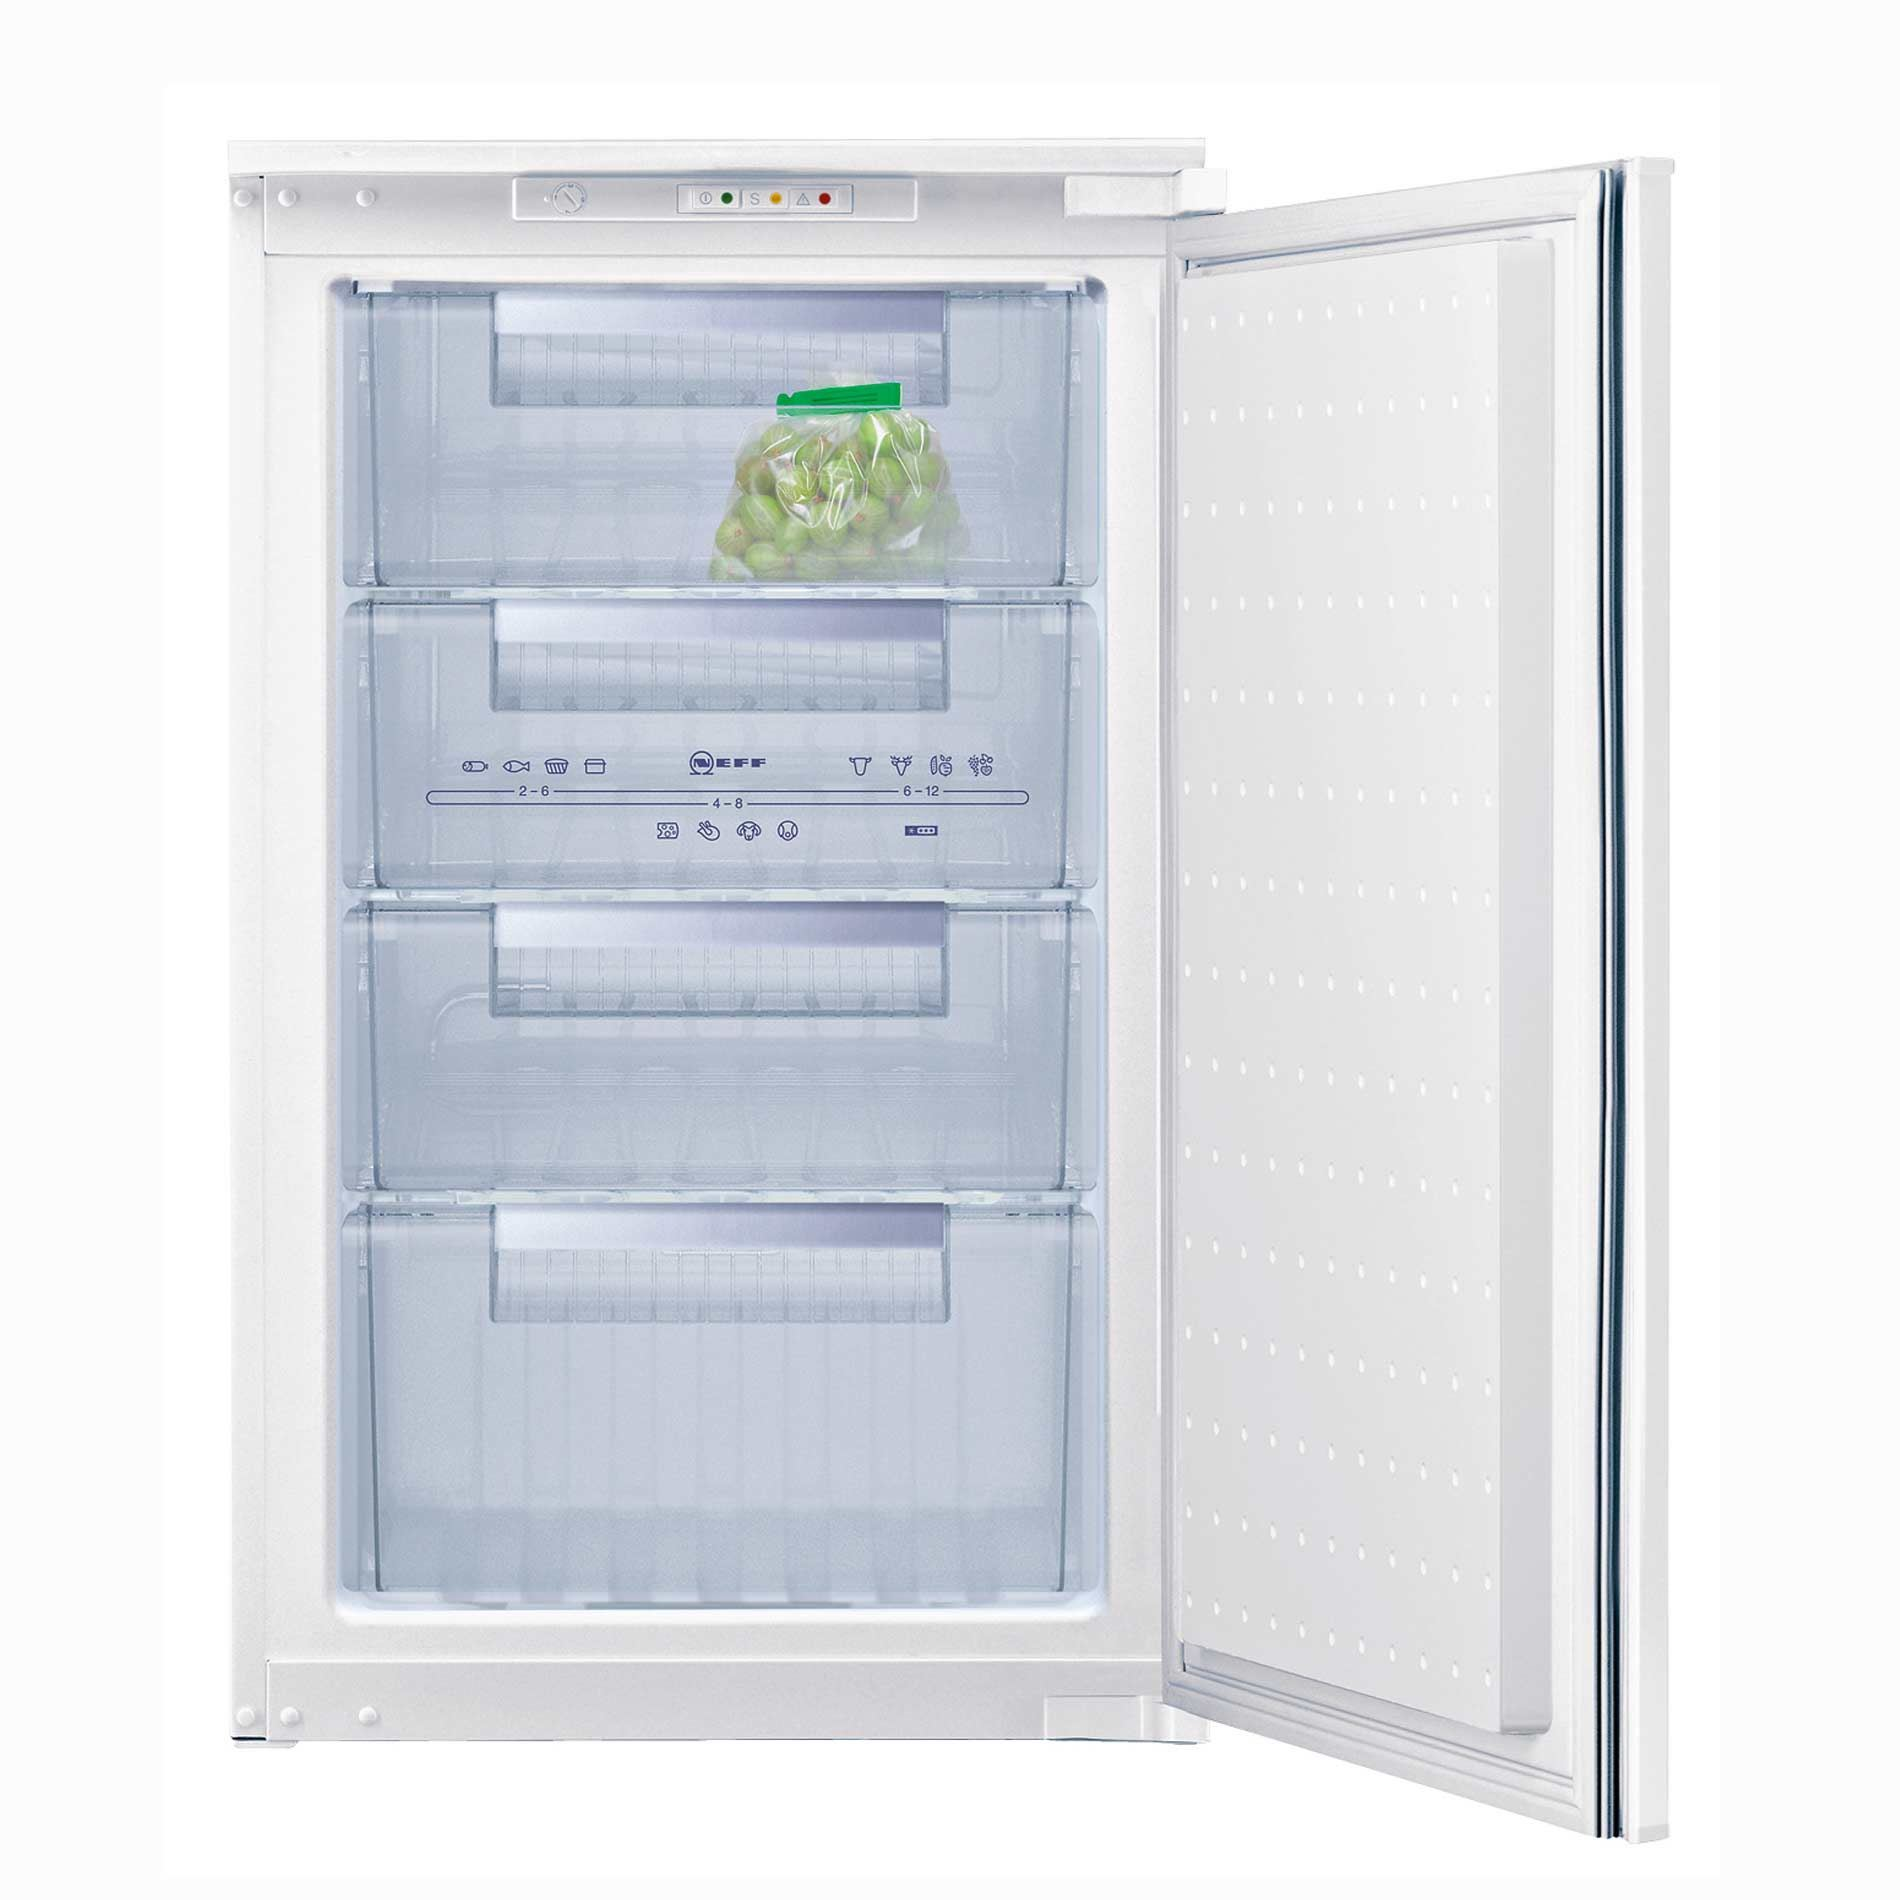 Appliance Source Neff G1524x7gb Built In Freezer